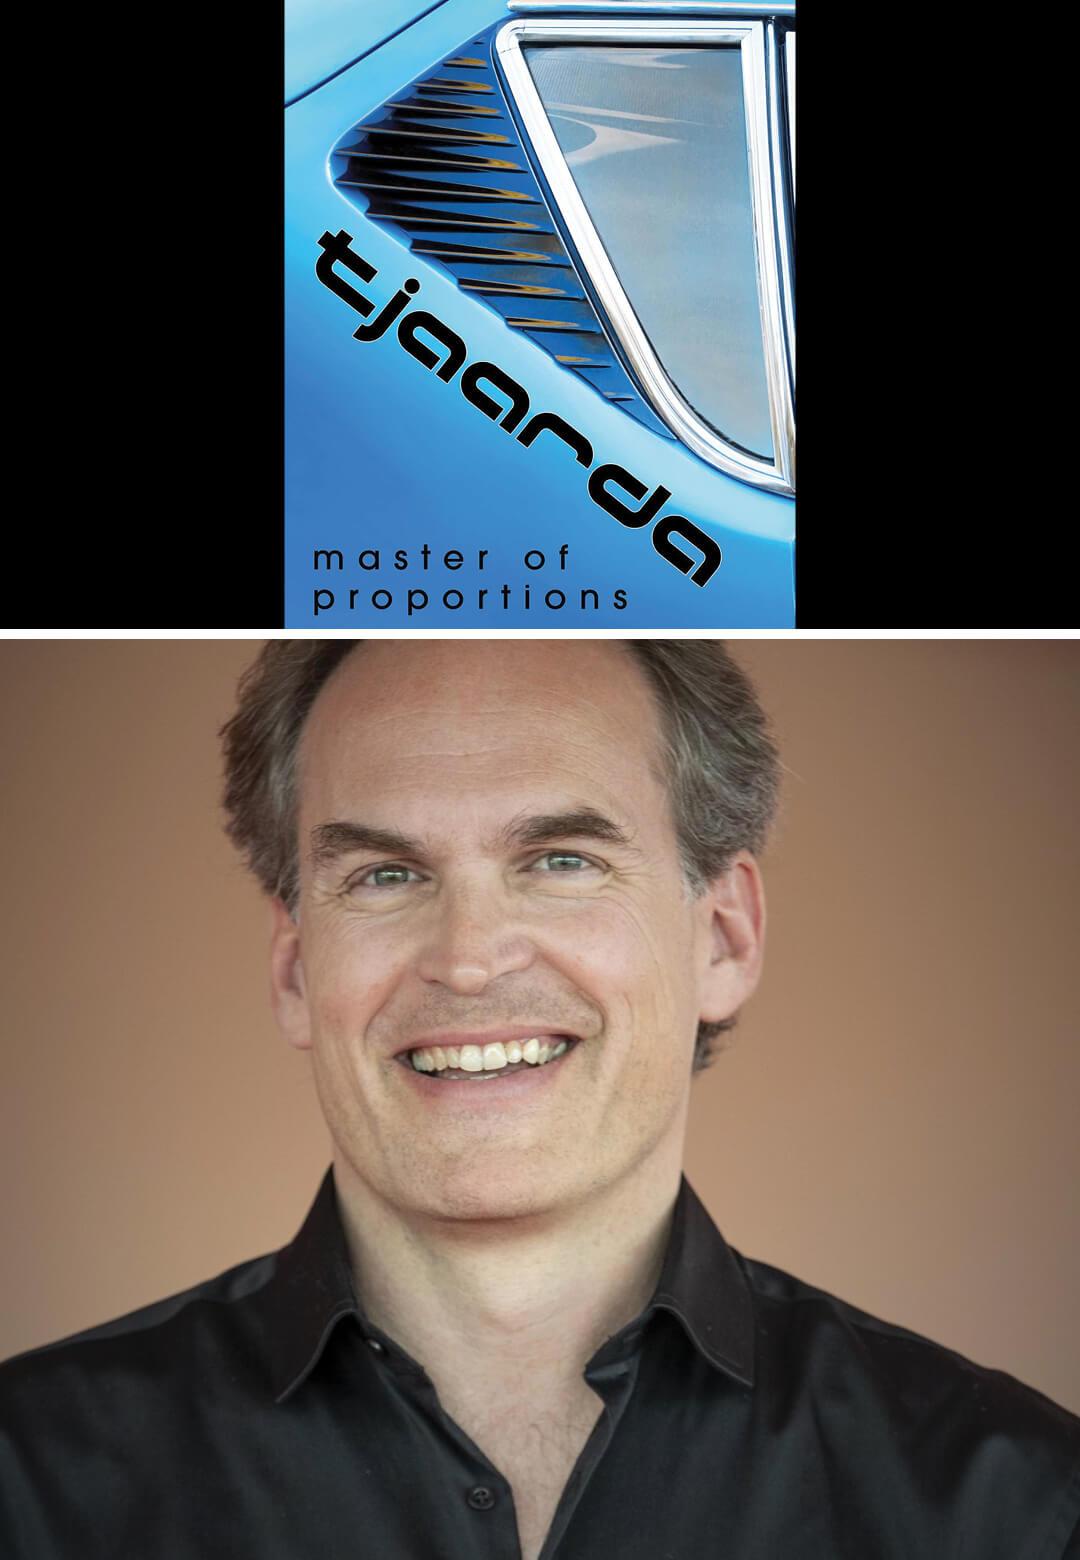 Ivo Groen delves into <em>Tom Tjaarda: Master of Proportions</em> by Paris-based automotive consultant, journalist and author, Gautam Sen   What Am I Reading: Ivo Groen   STIRworld